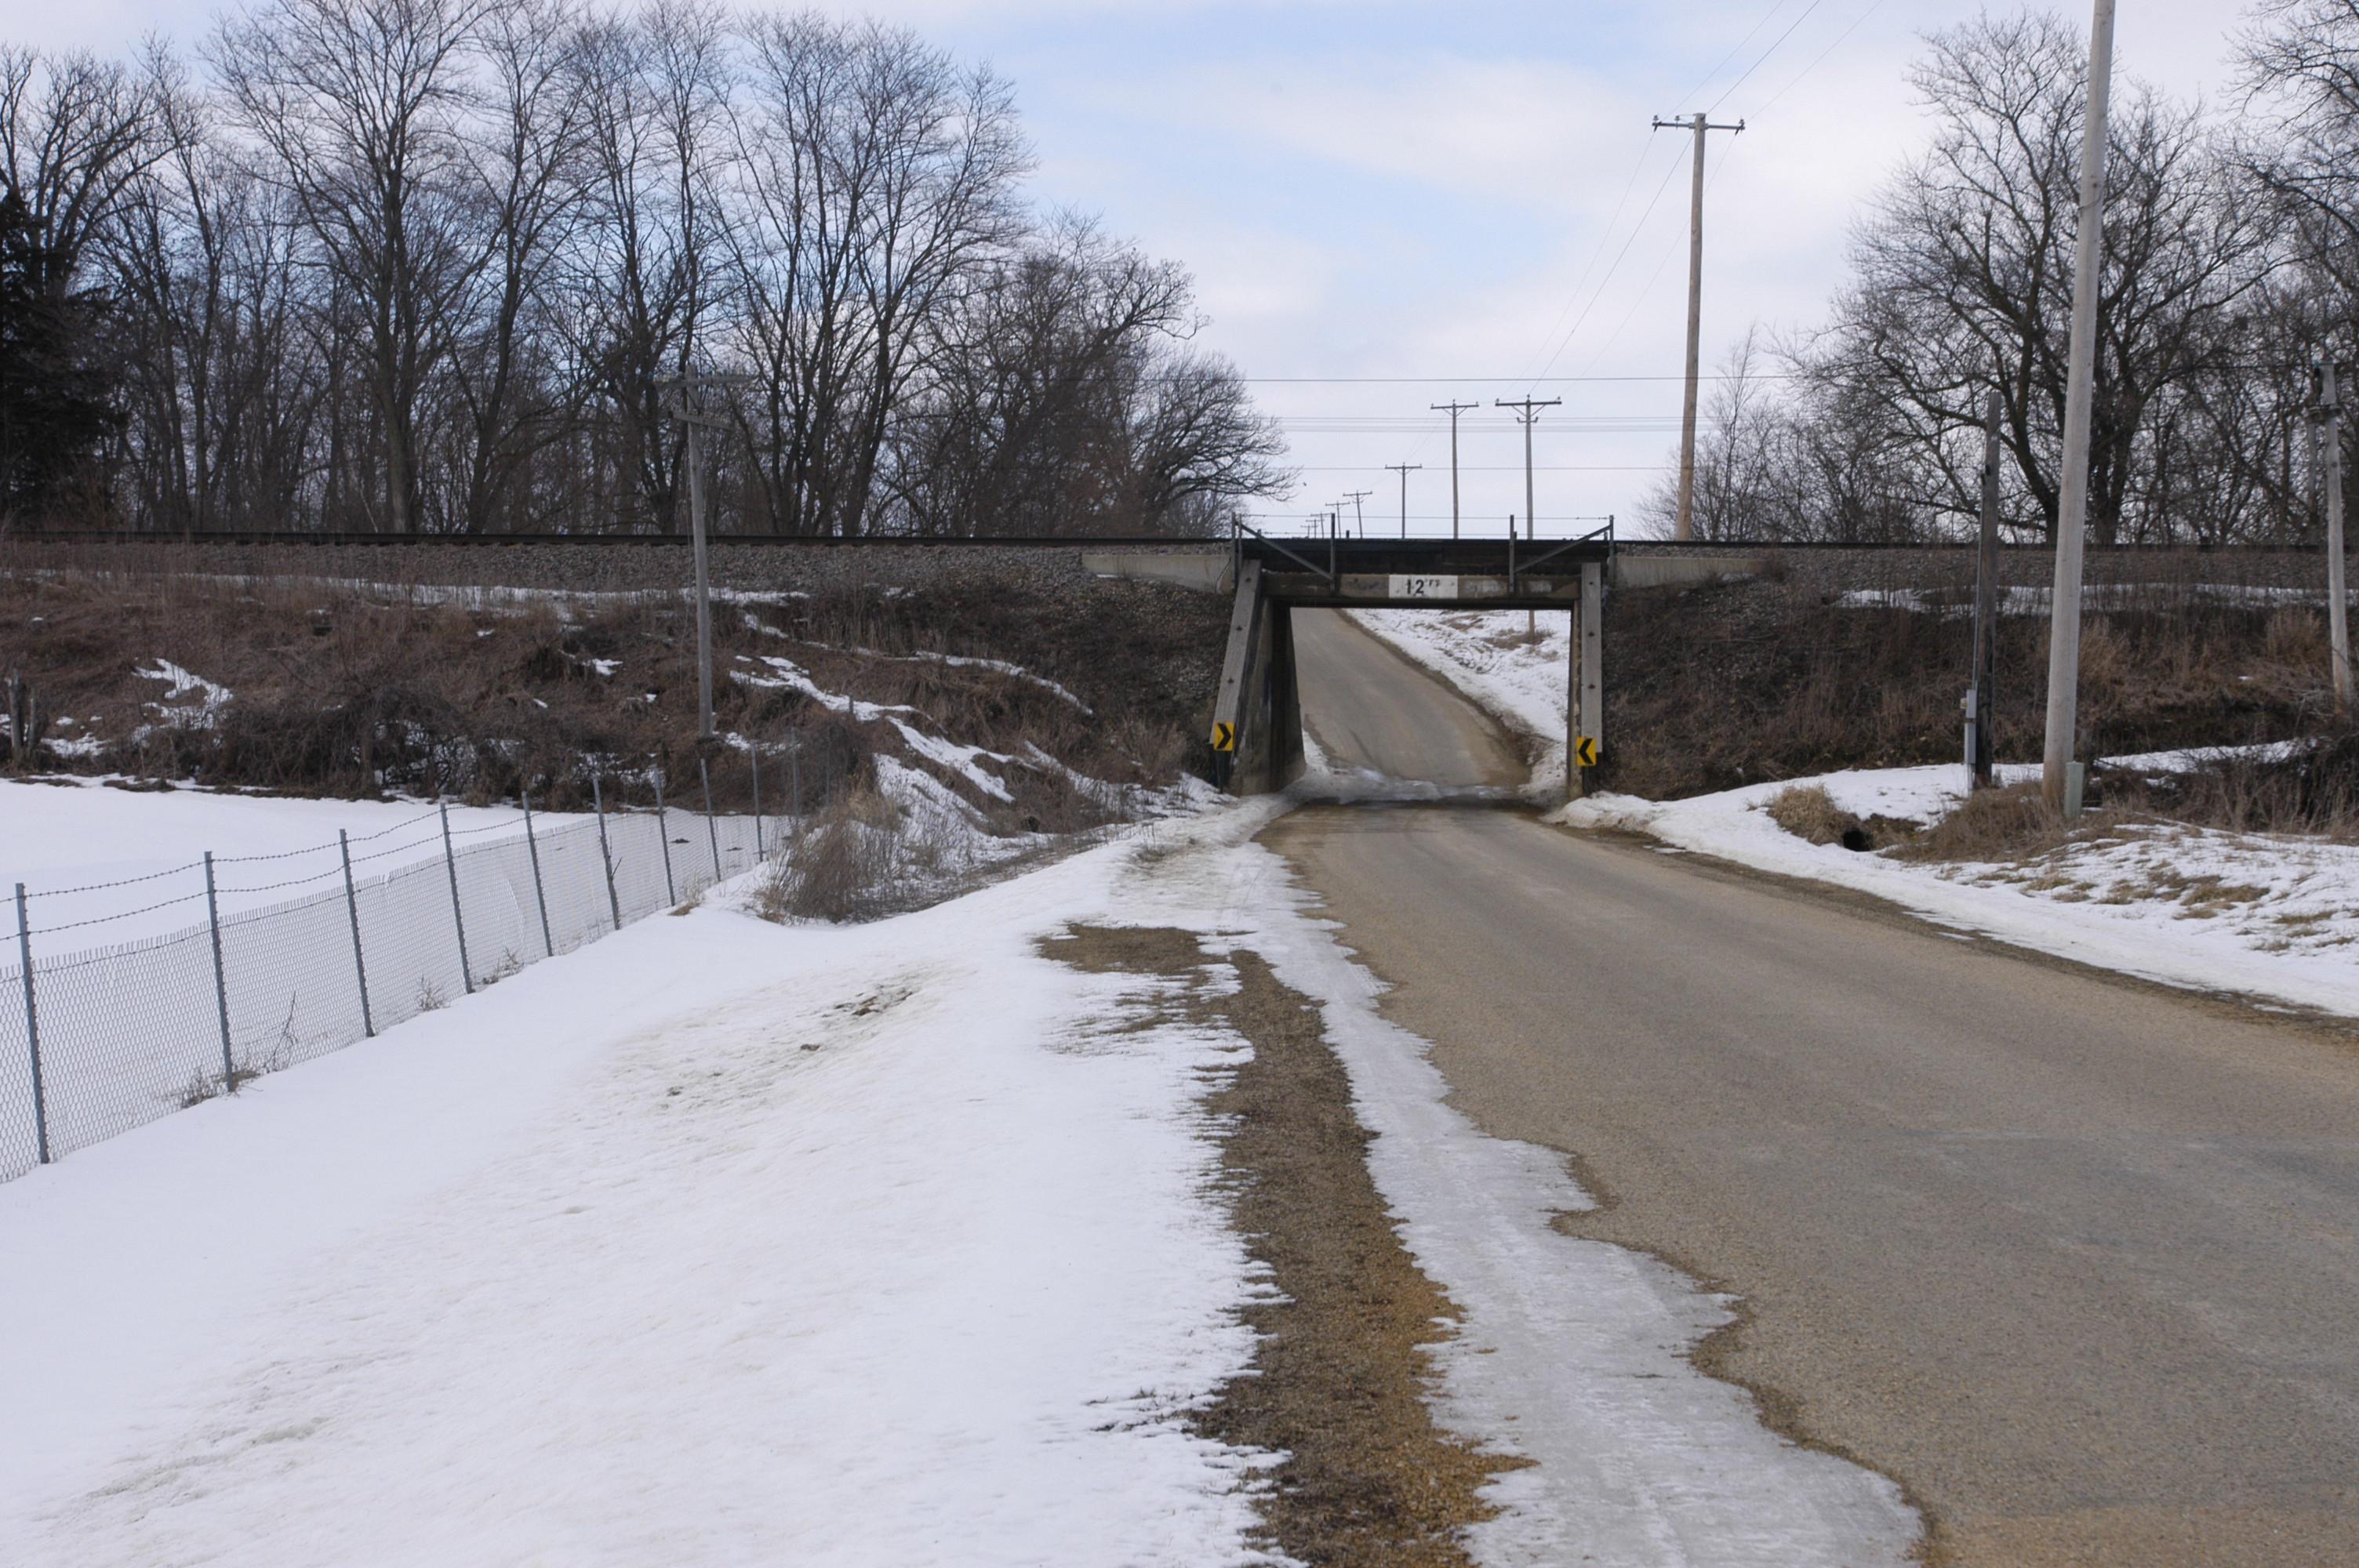 Illinois ogle county polo - File Ogle County Near Polo Il One Lane Bridge Jpg